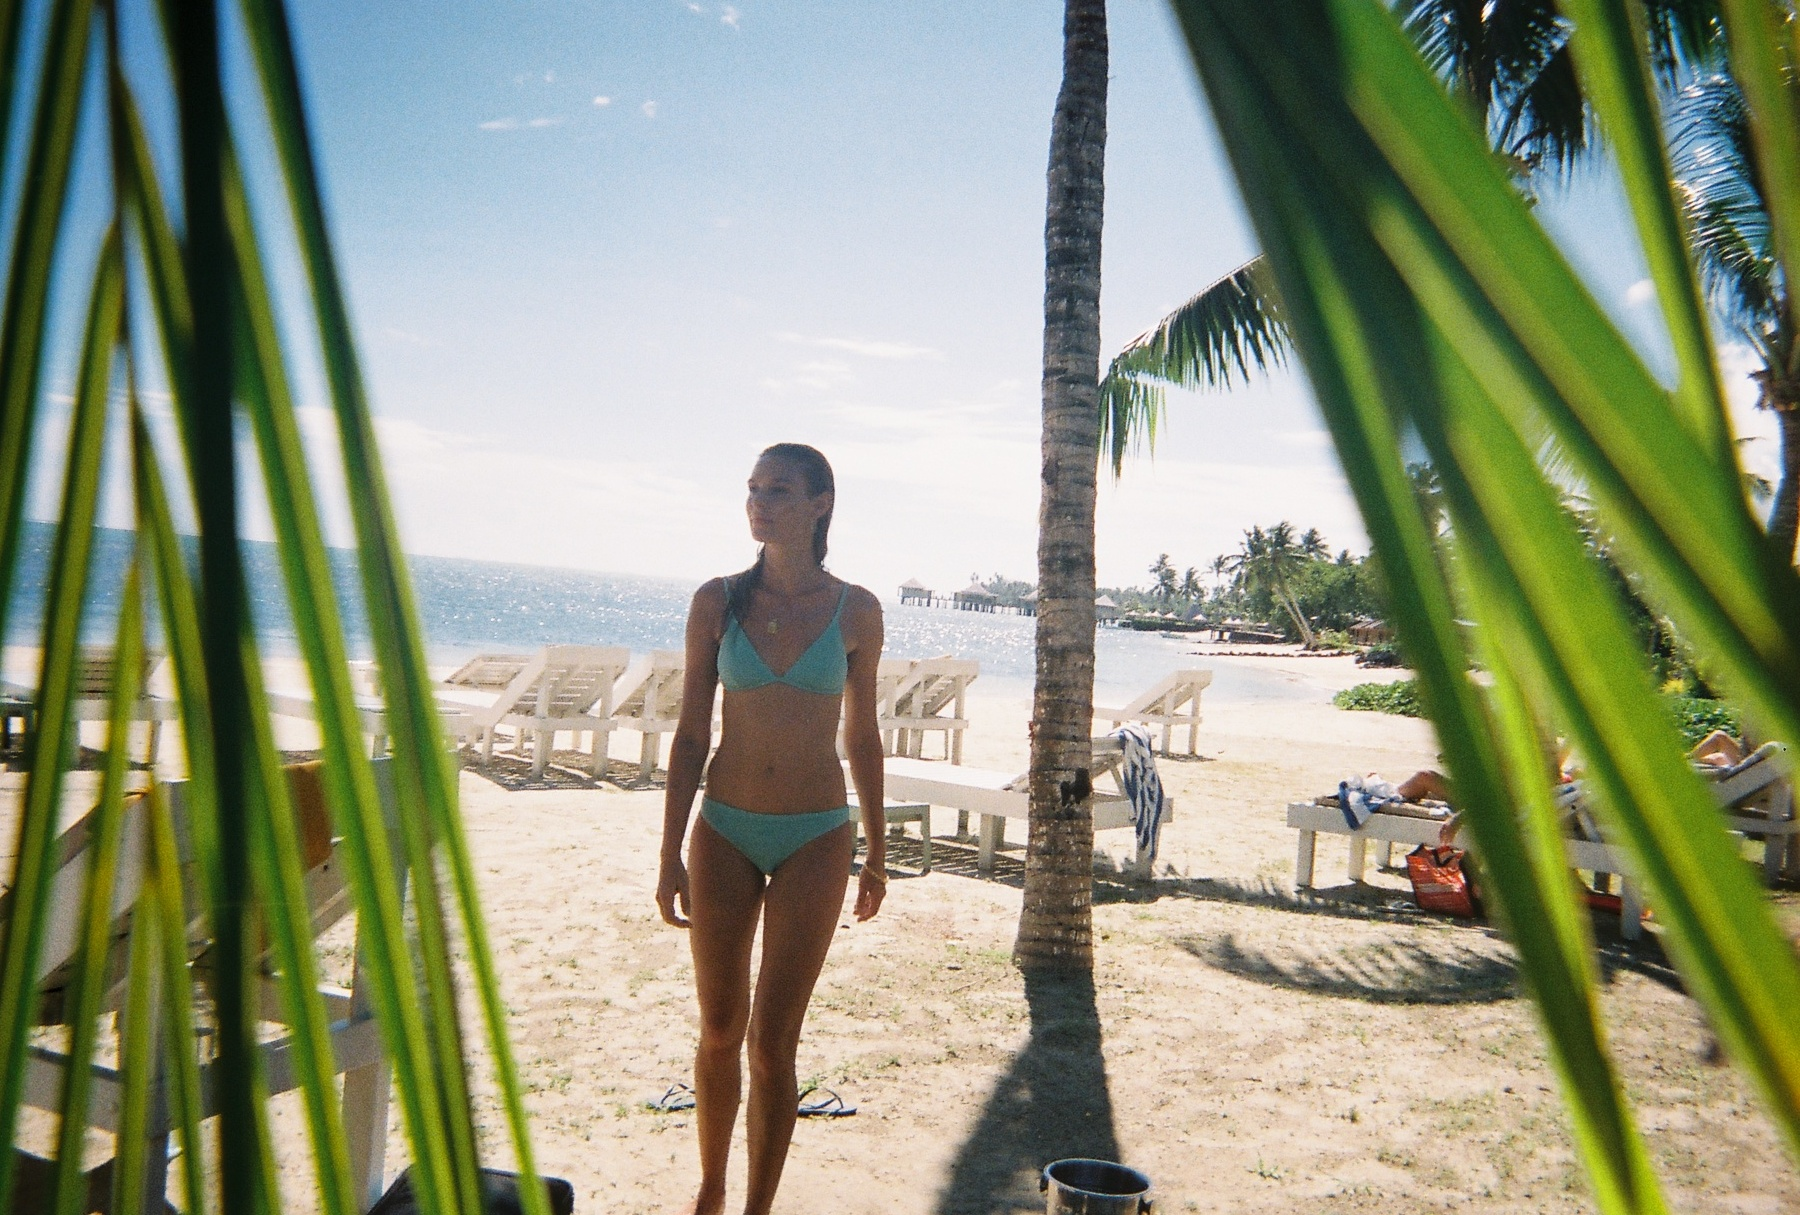 Rhythm Palm Springs Bralette Top & Cheeky Pant in Aruba.jpg